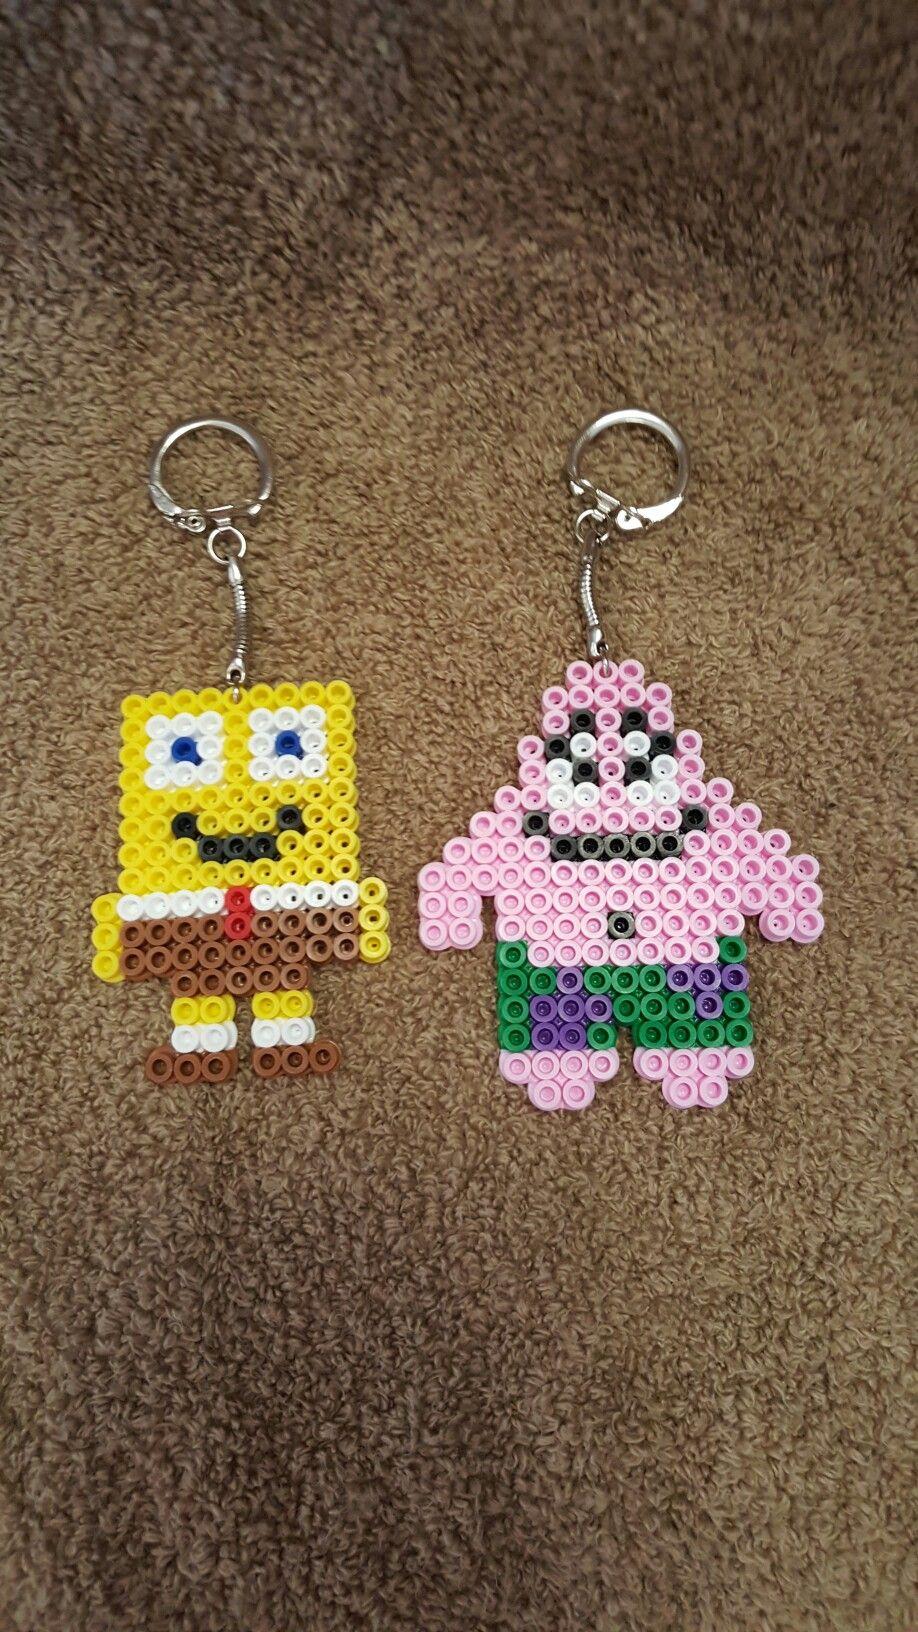 db600bbdfdd5 Spongebob and Patrick